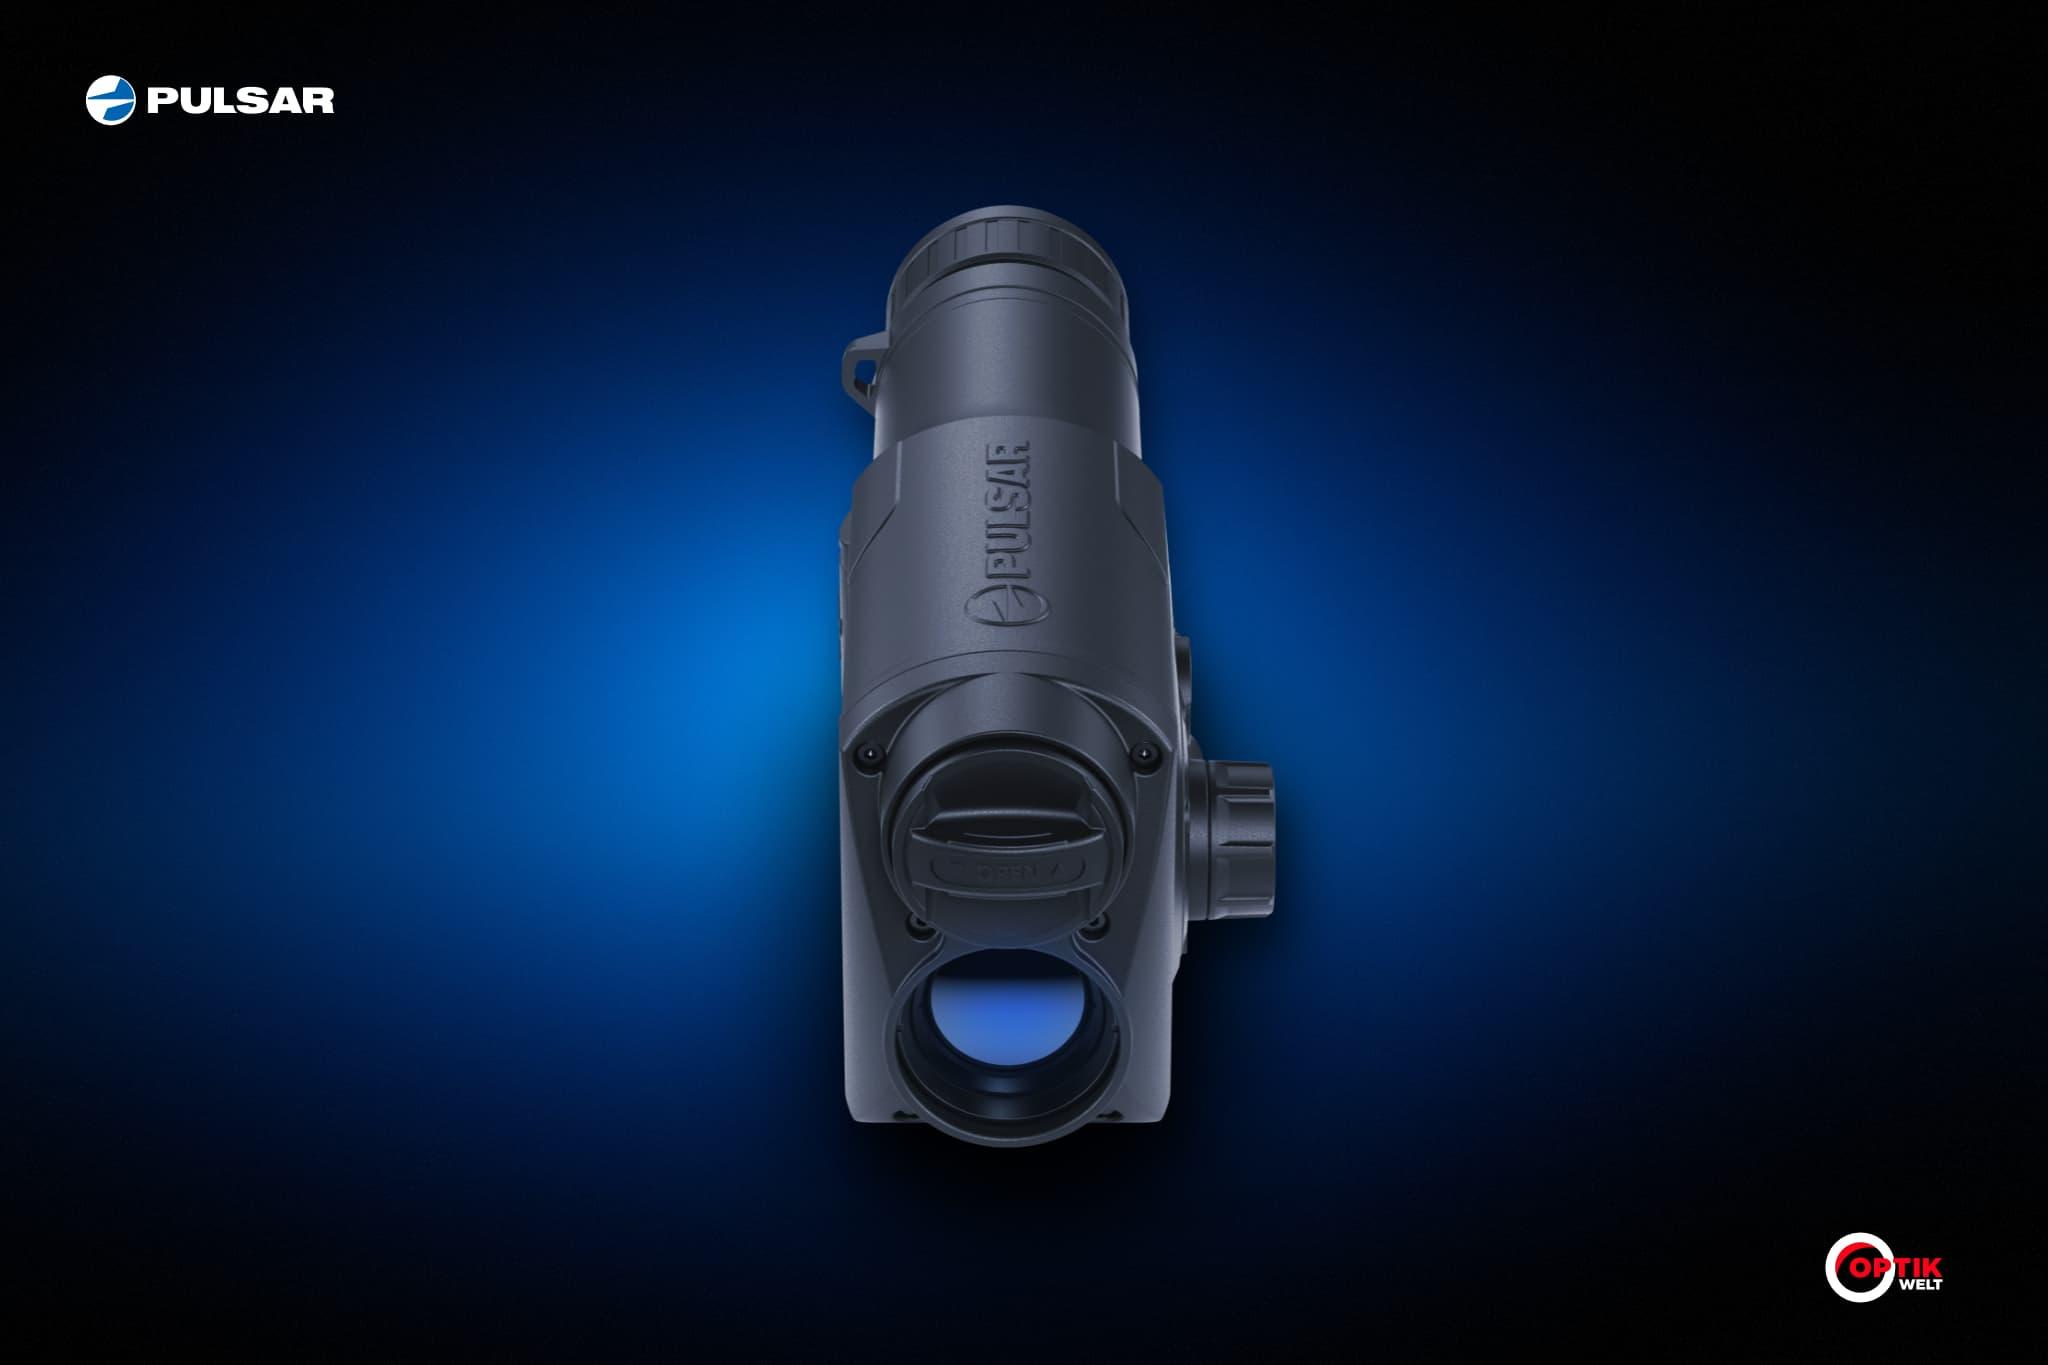 Termokaamera Pulsar Proton XQ30